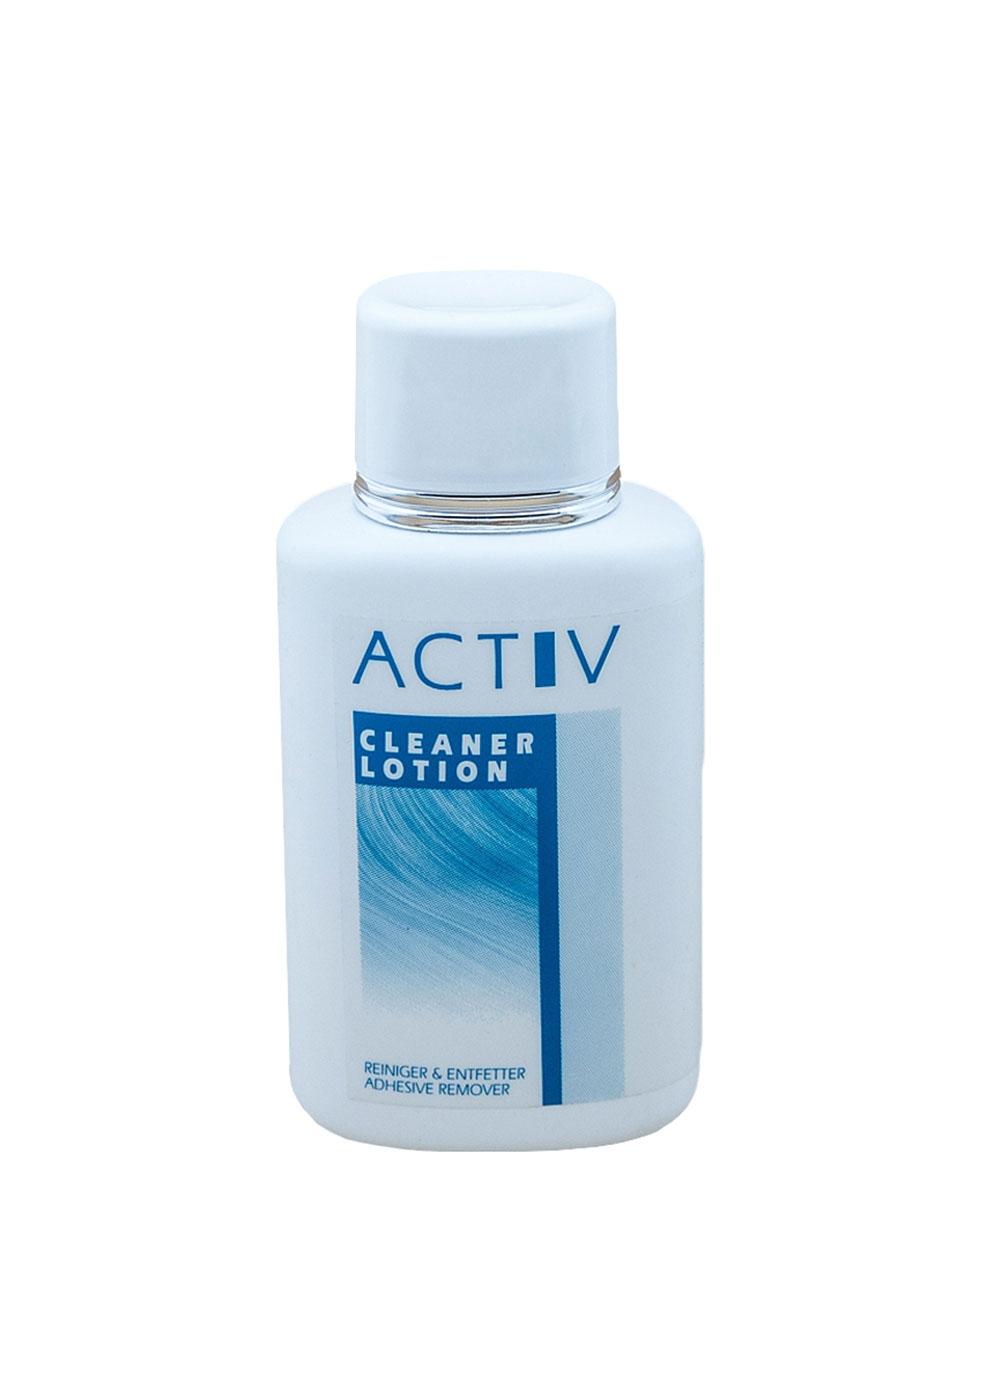 GFH Zubehör - Activ Cleaner Lotion 250ml